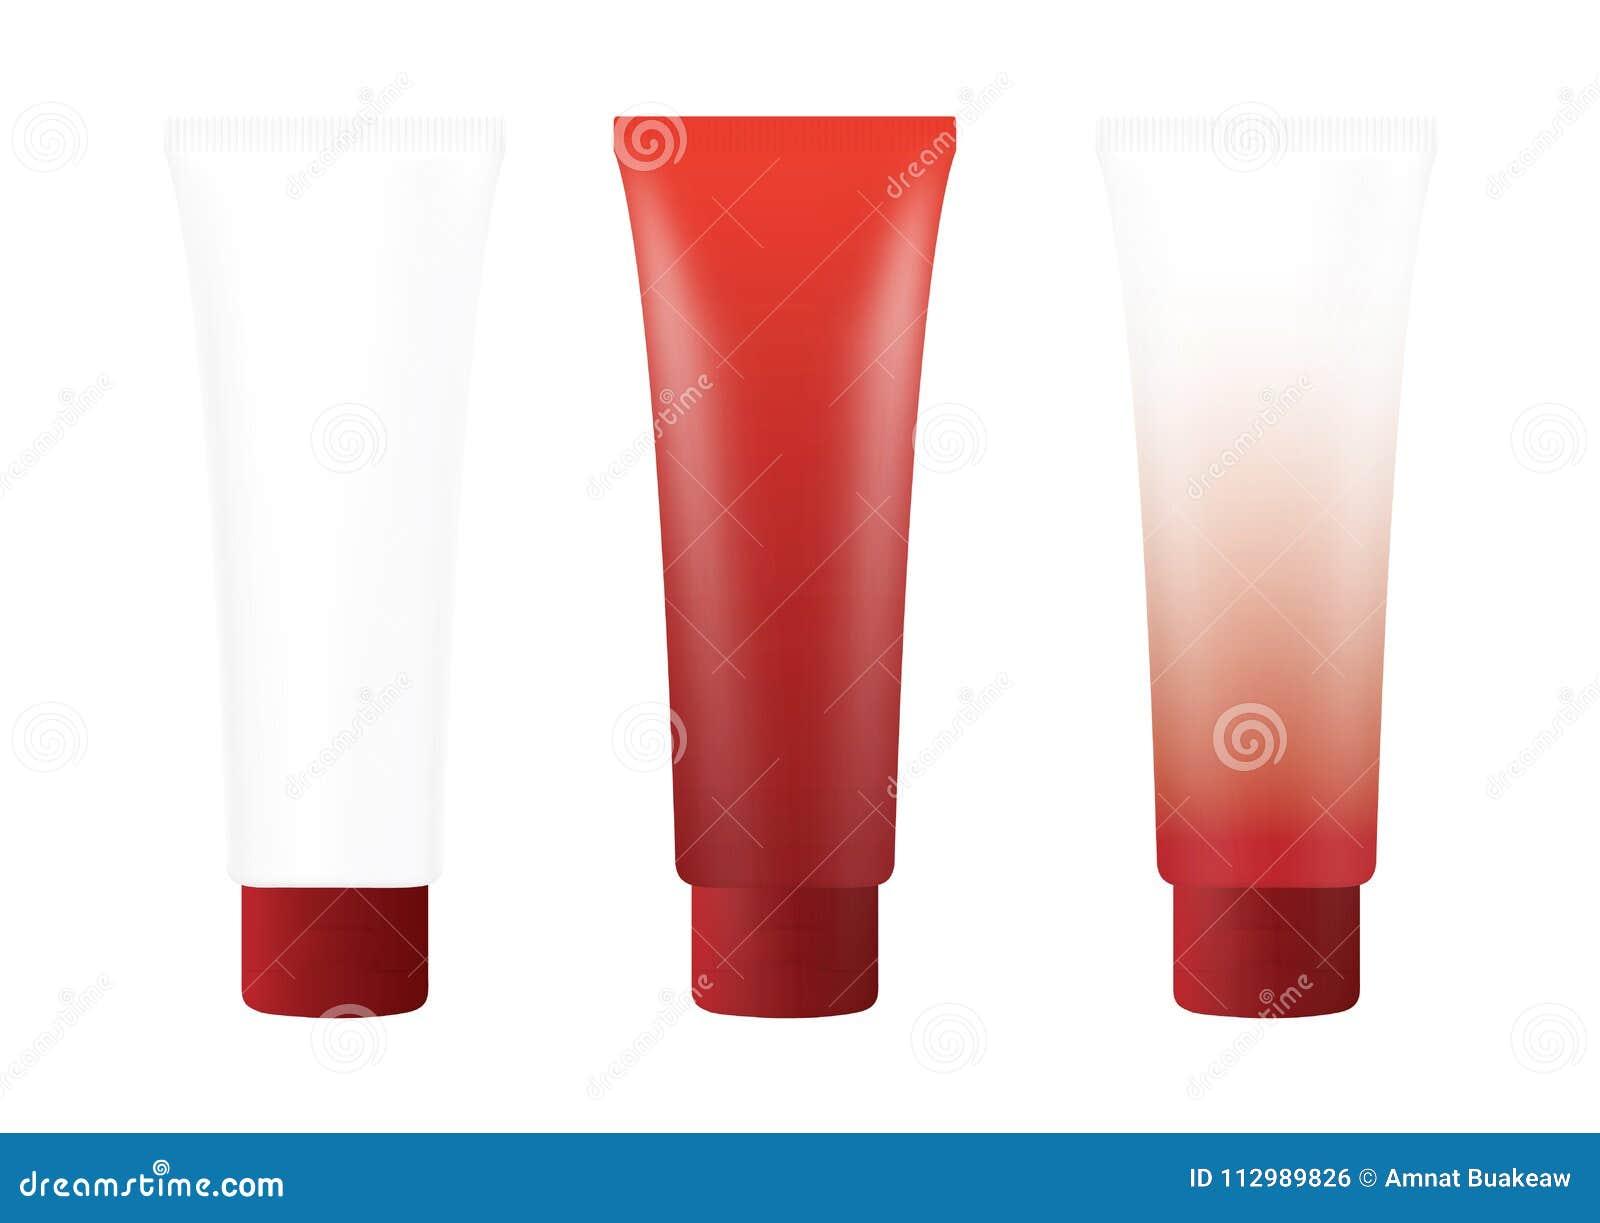 Tube Red Cream Foam Bottle on white background isolated, cosmetics, cream tube treatment tube white